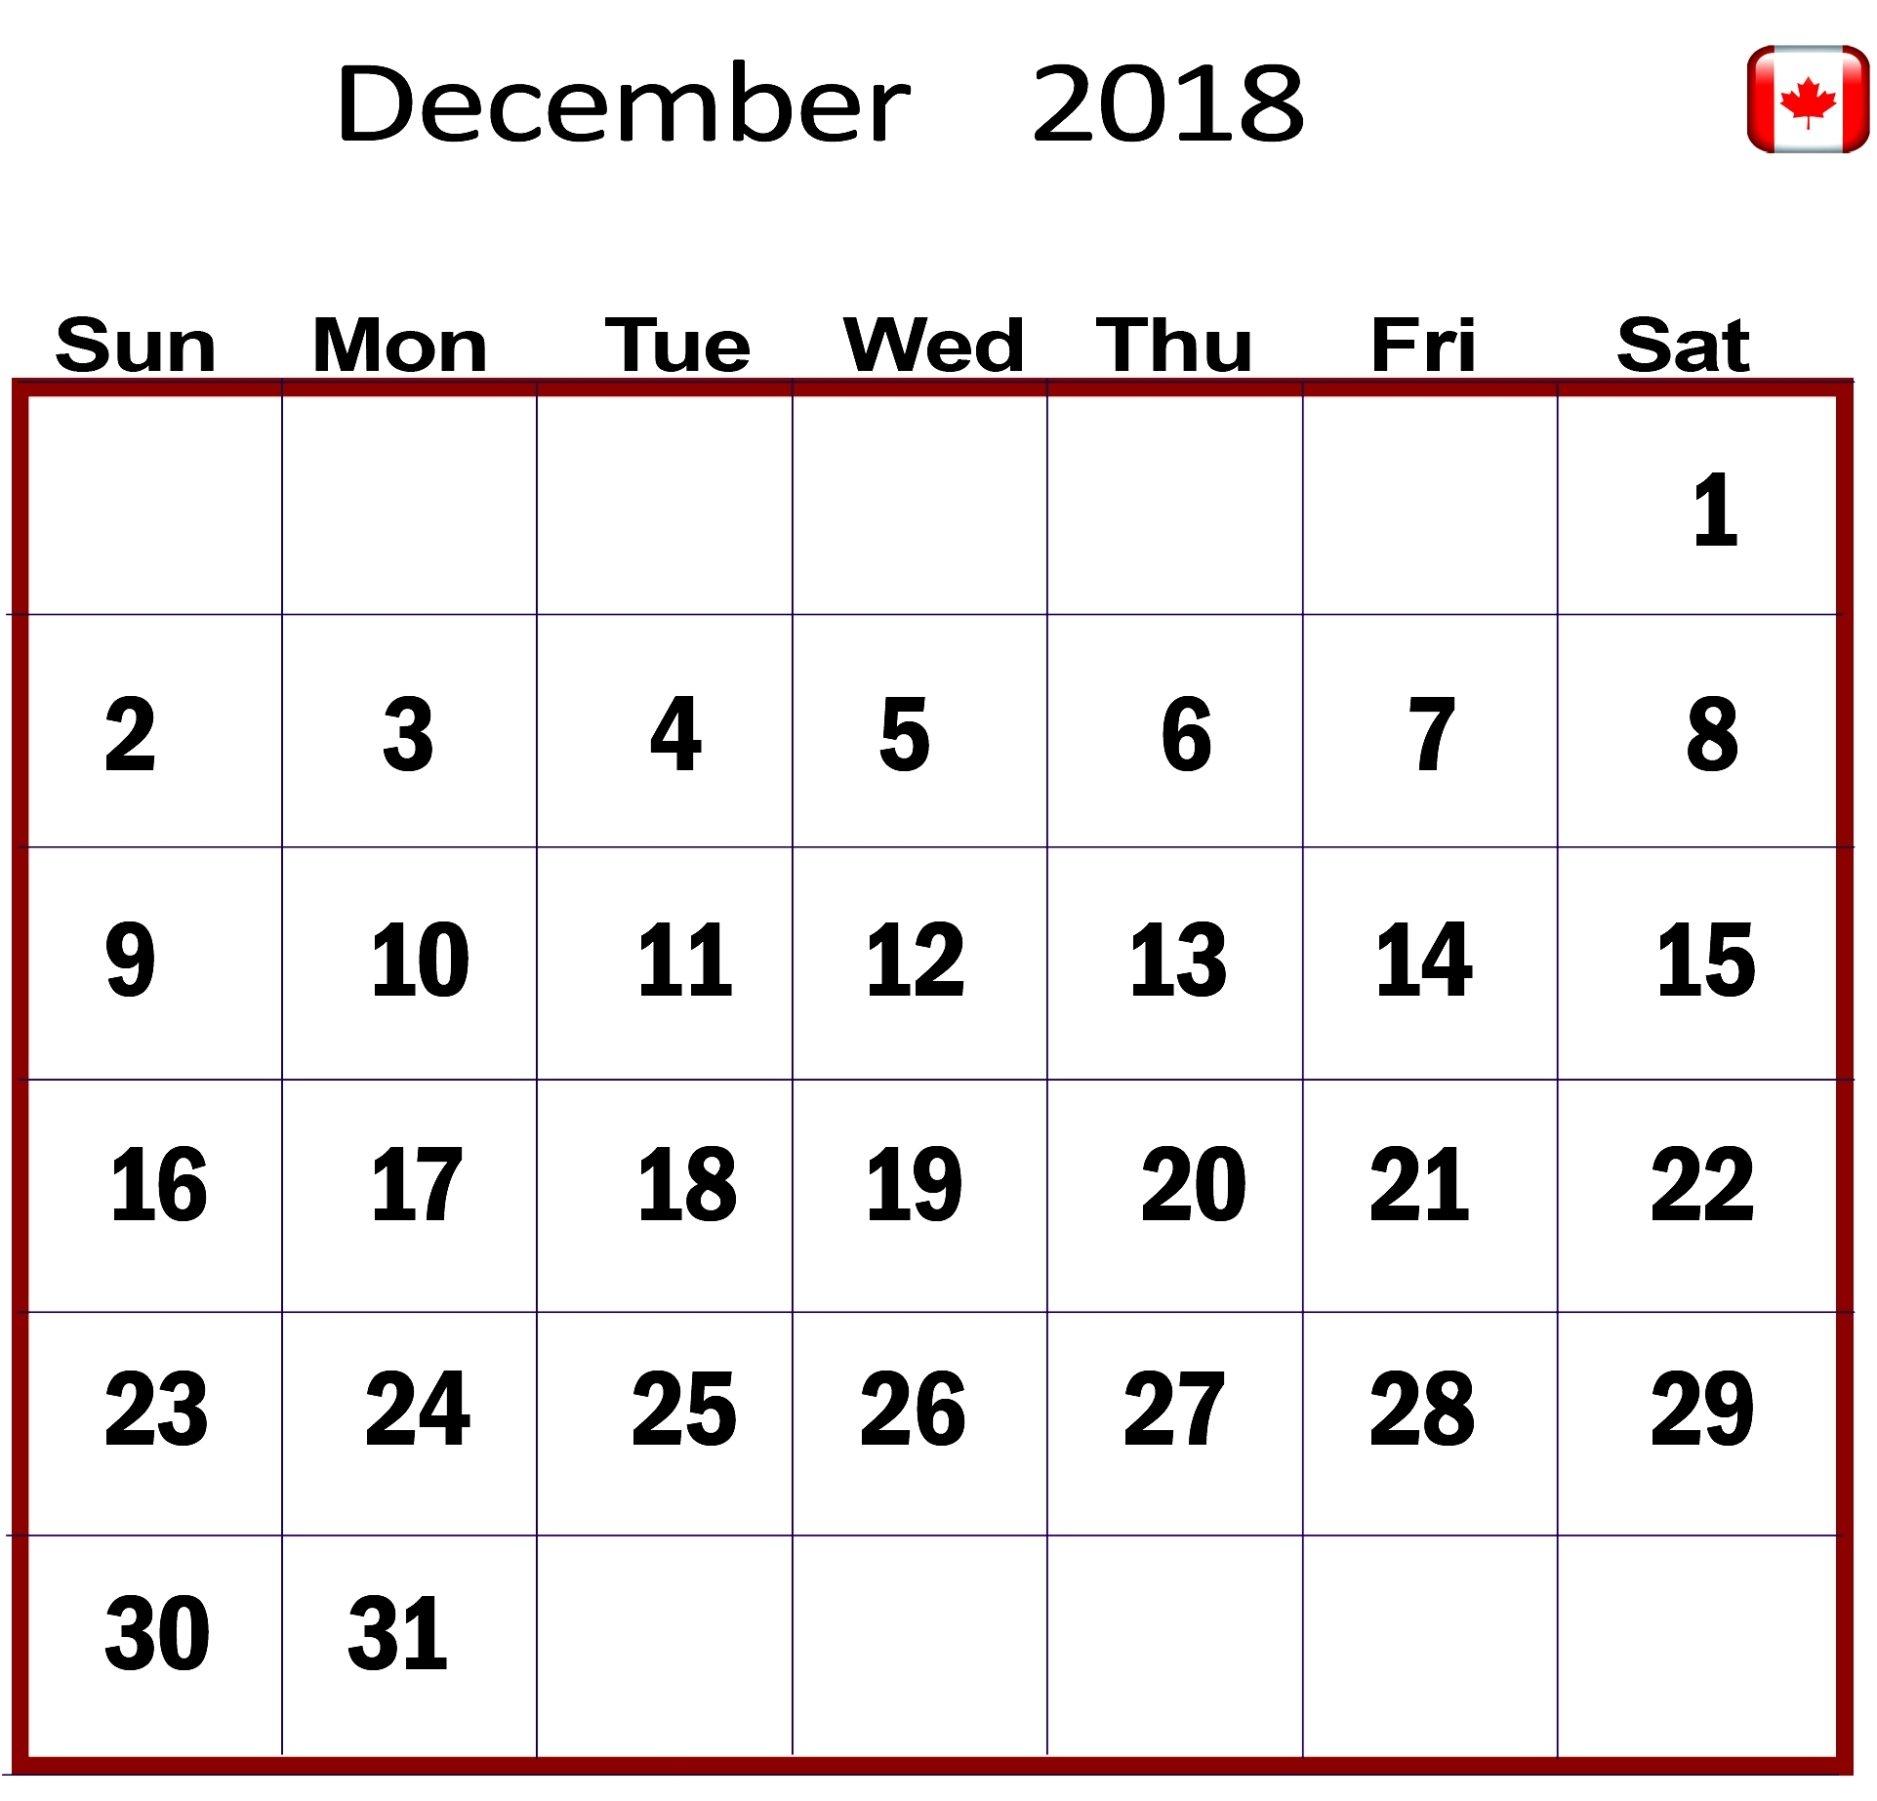 december 2018 calendar canada printable calendar template letter::December 2018 Calendar Printable Template USA UK Canada